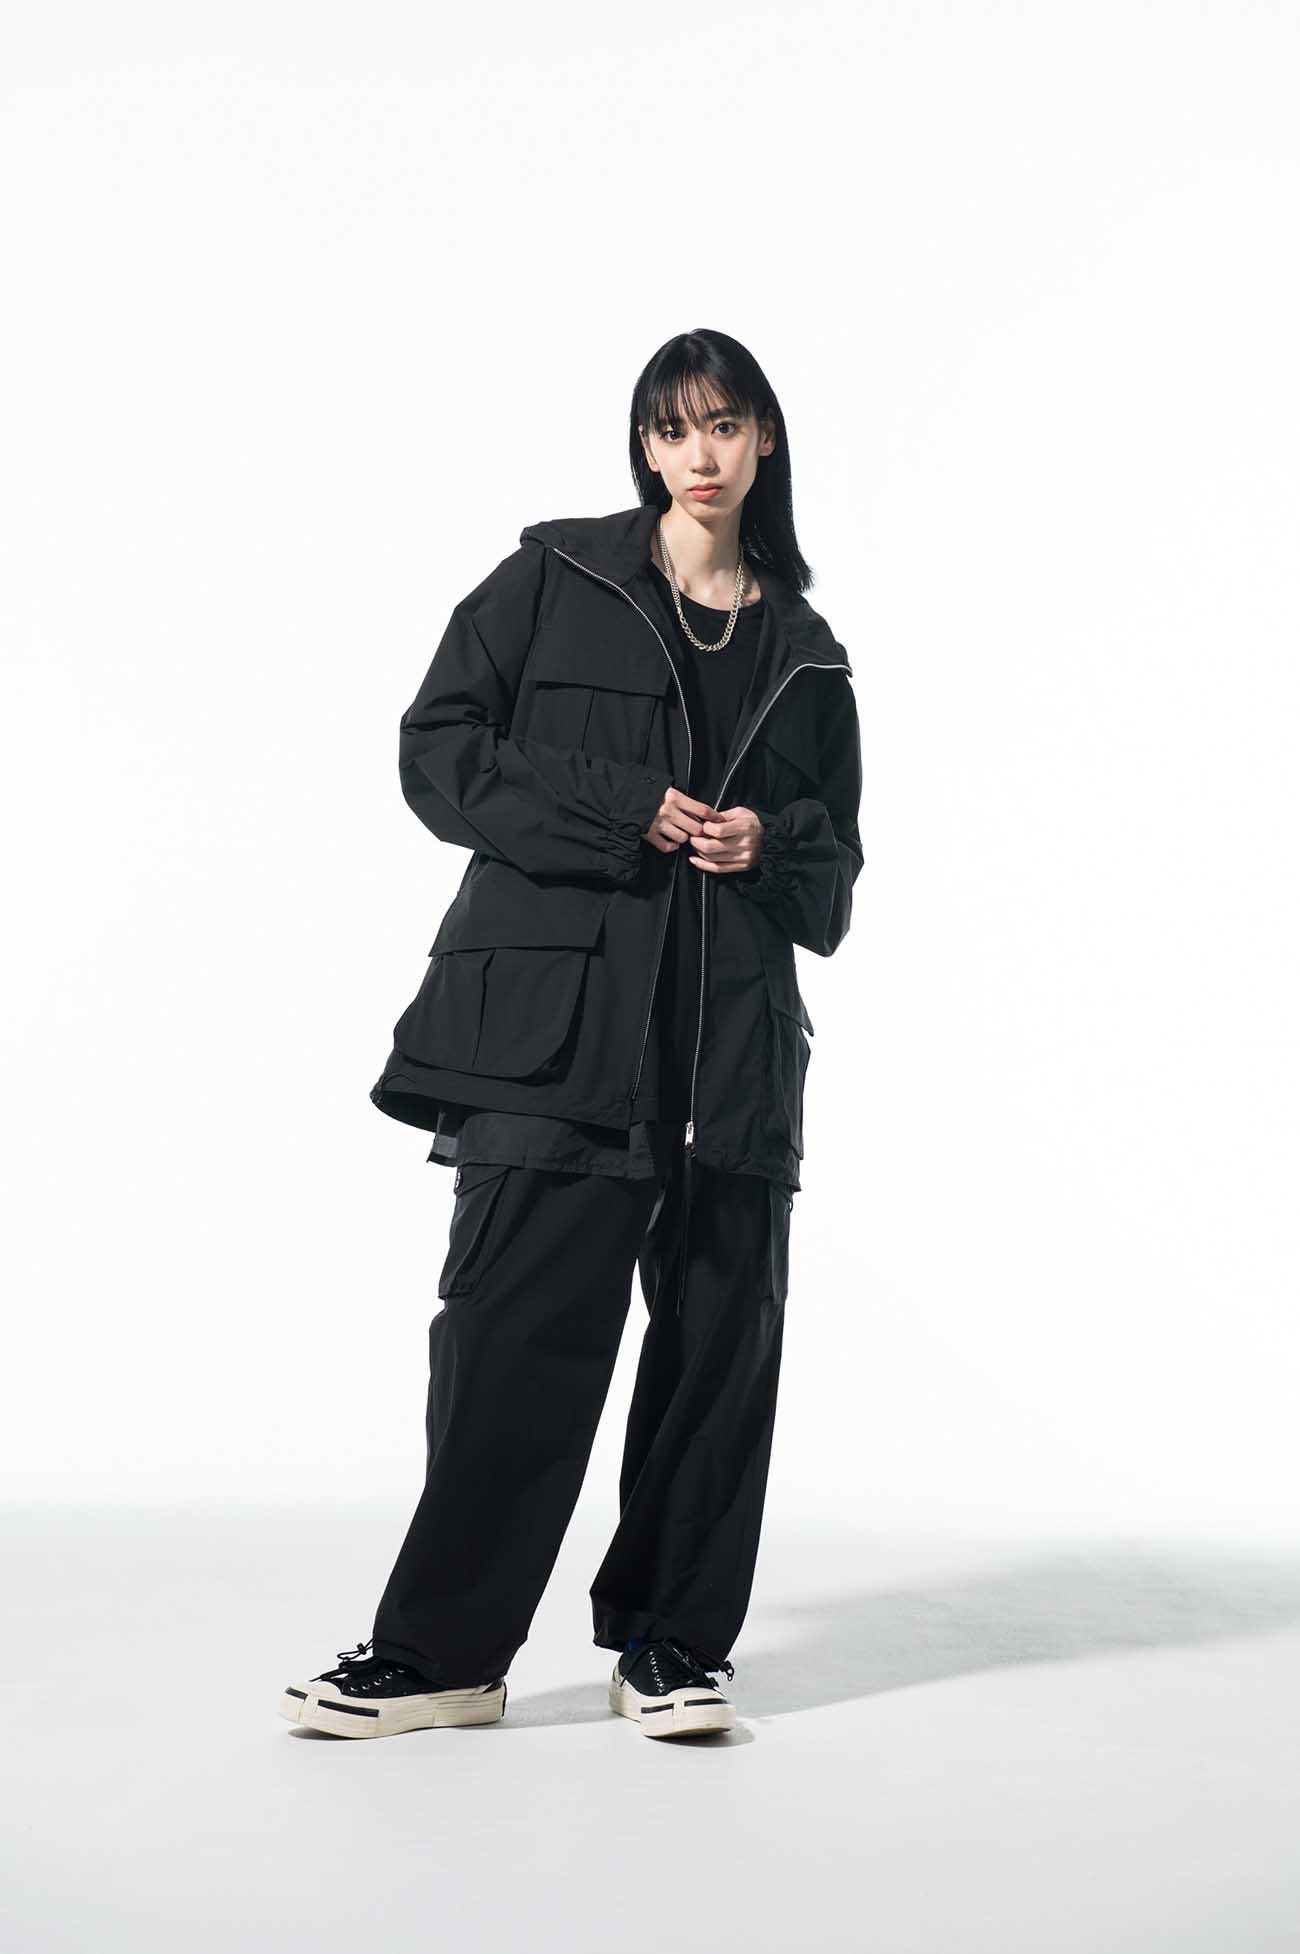 Solotex Packable Traveler Fatigue Soft Shell Jacket